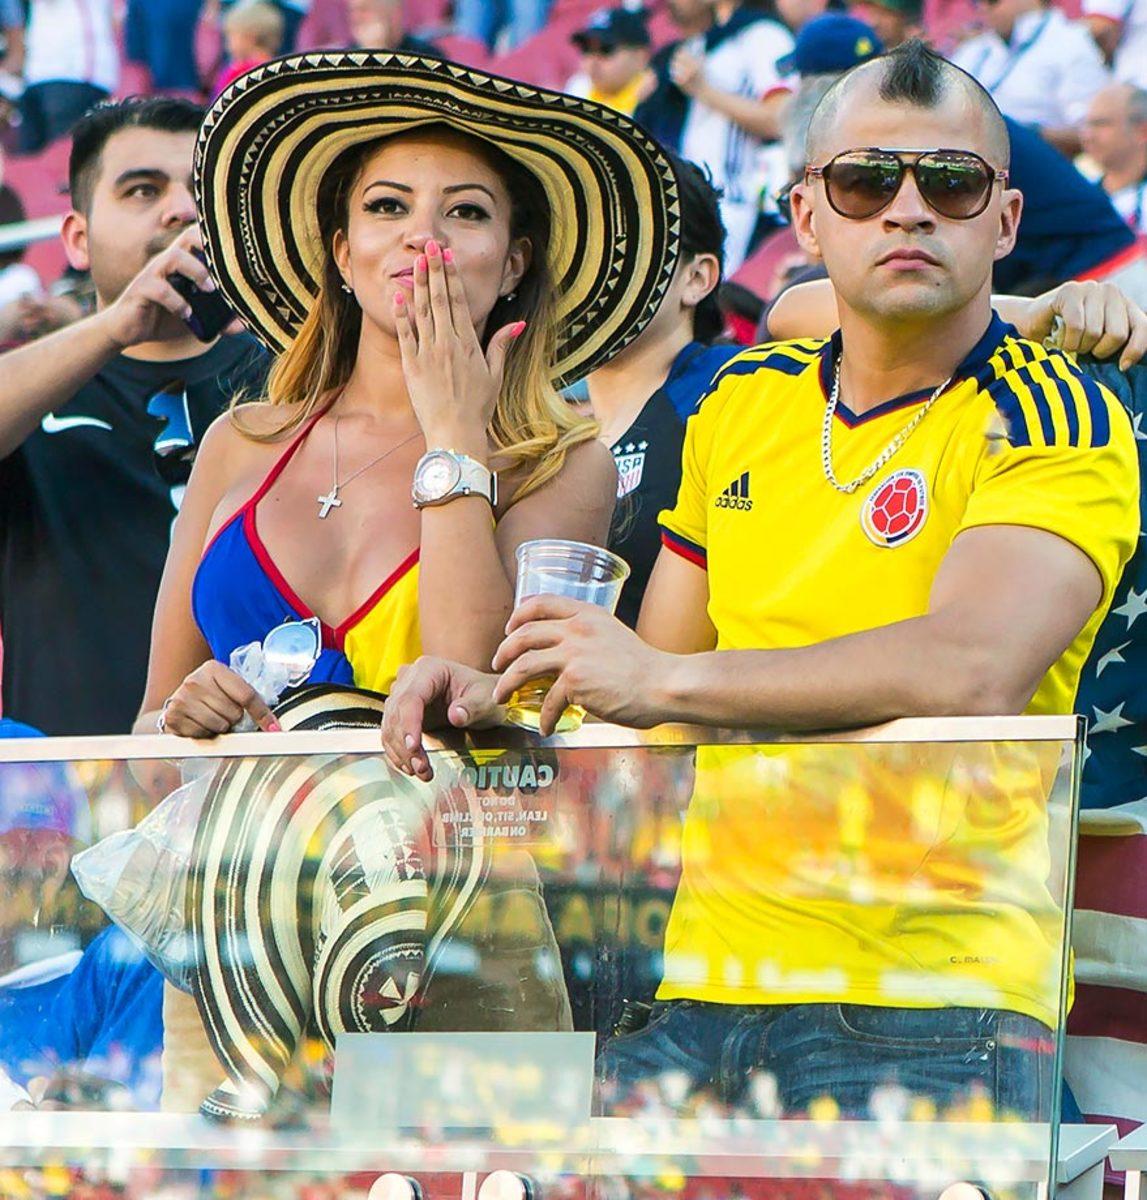 Colombia-fans-CIG16060308_USA_v_COL.jpg